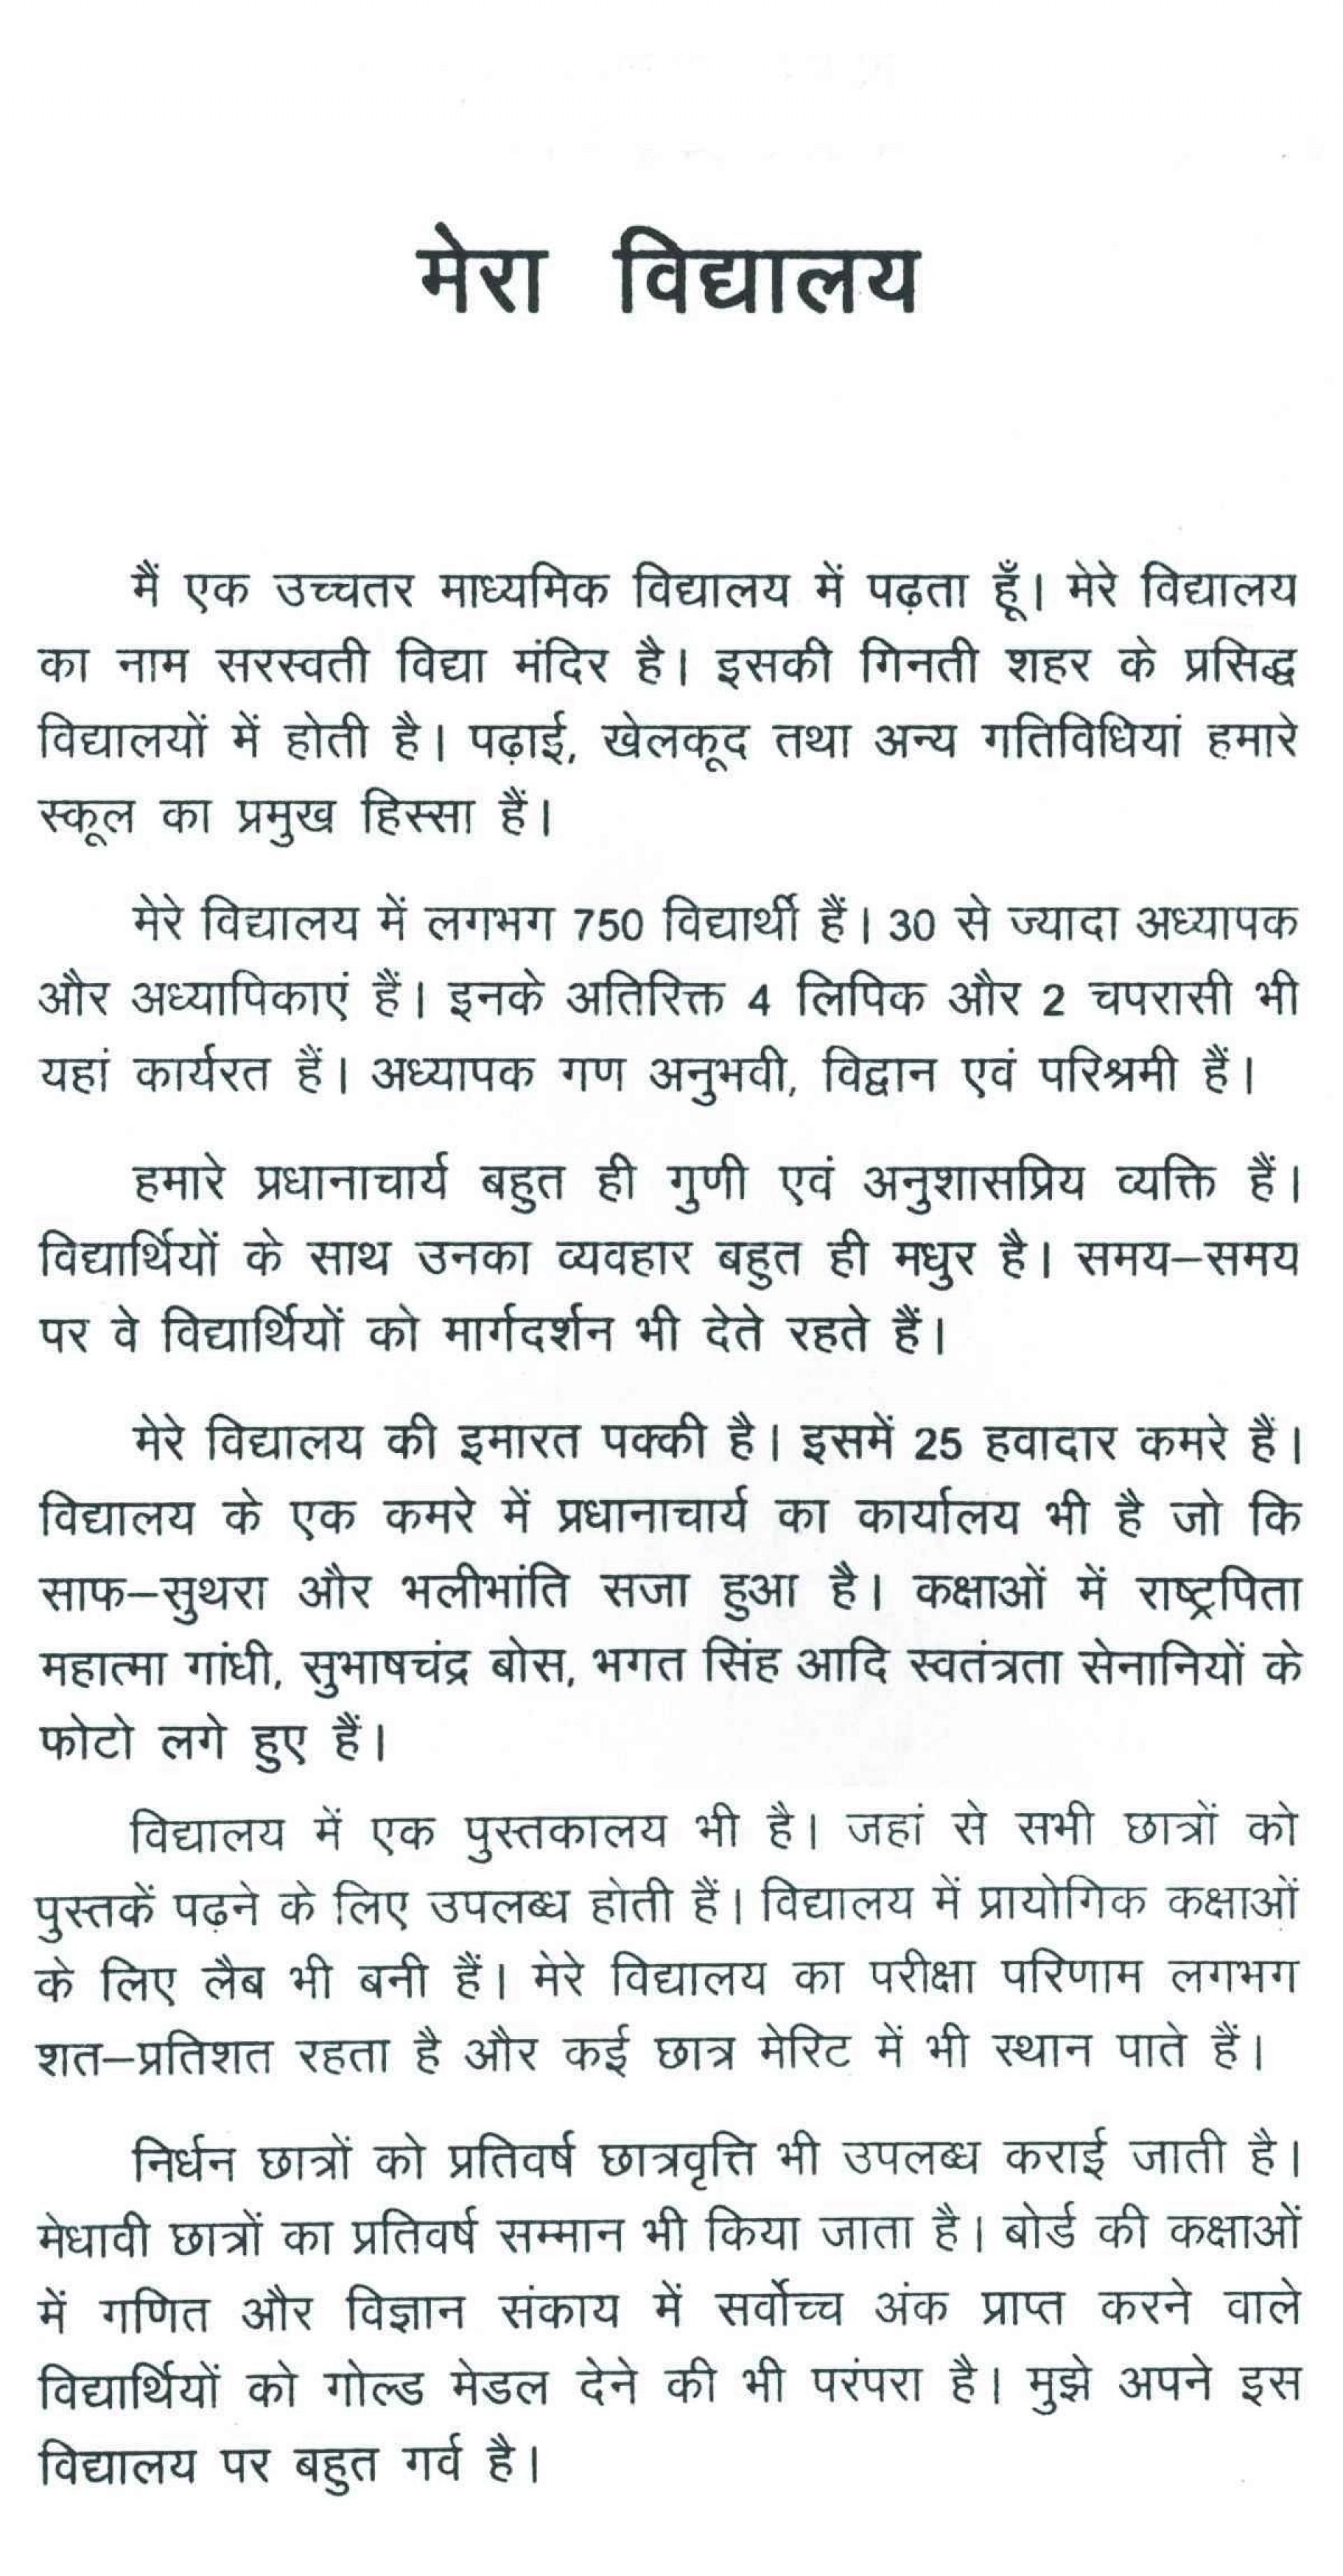 005 My School Essay O4mldyykxk Amazing Dream For Class 10 In Urdu 1 3 Marathi 1920